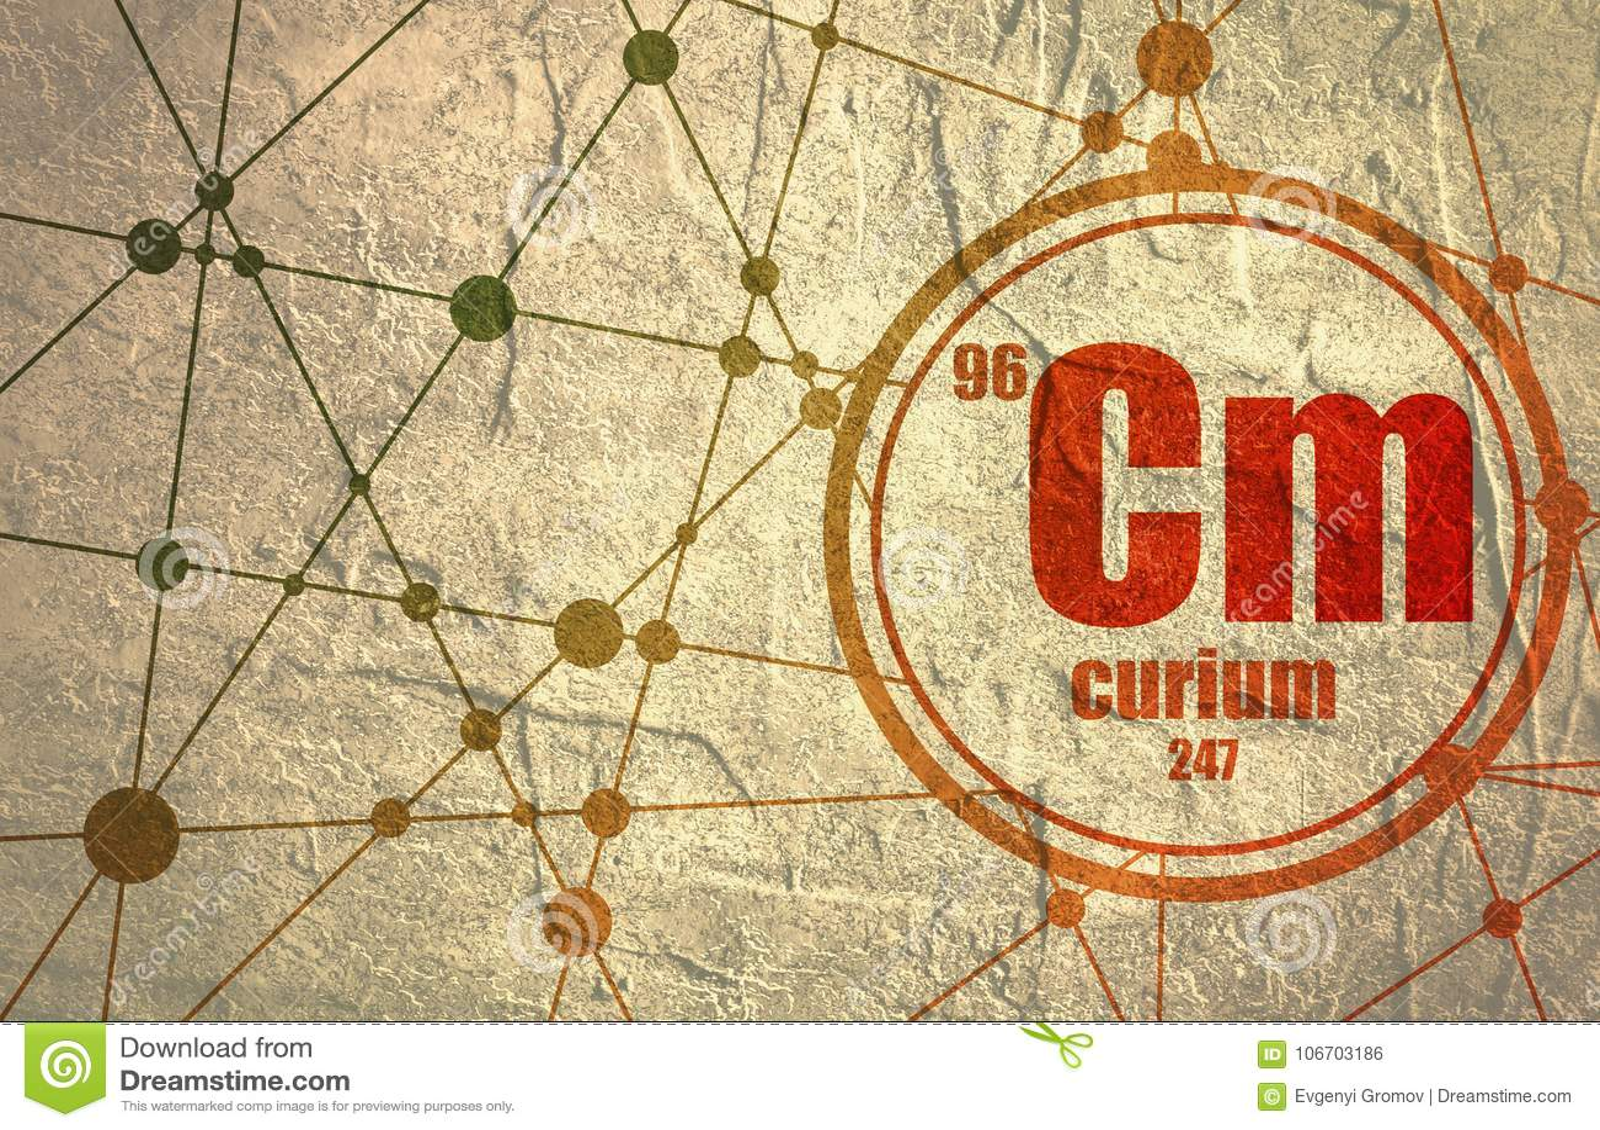 Curium Chemical Element Stock Illustration Illustration Of